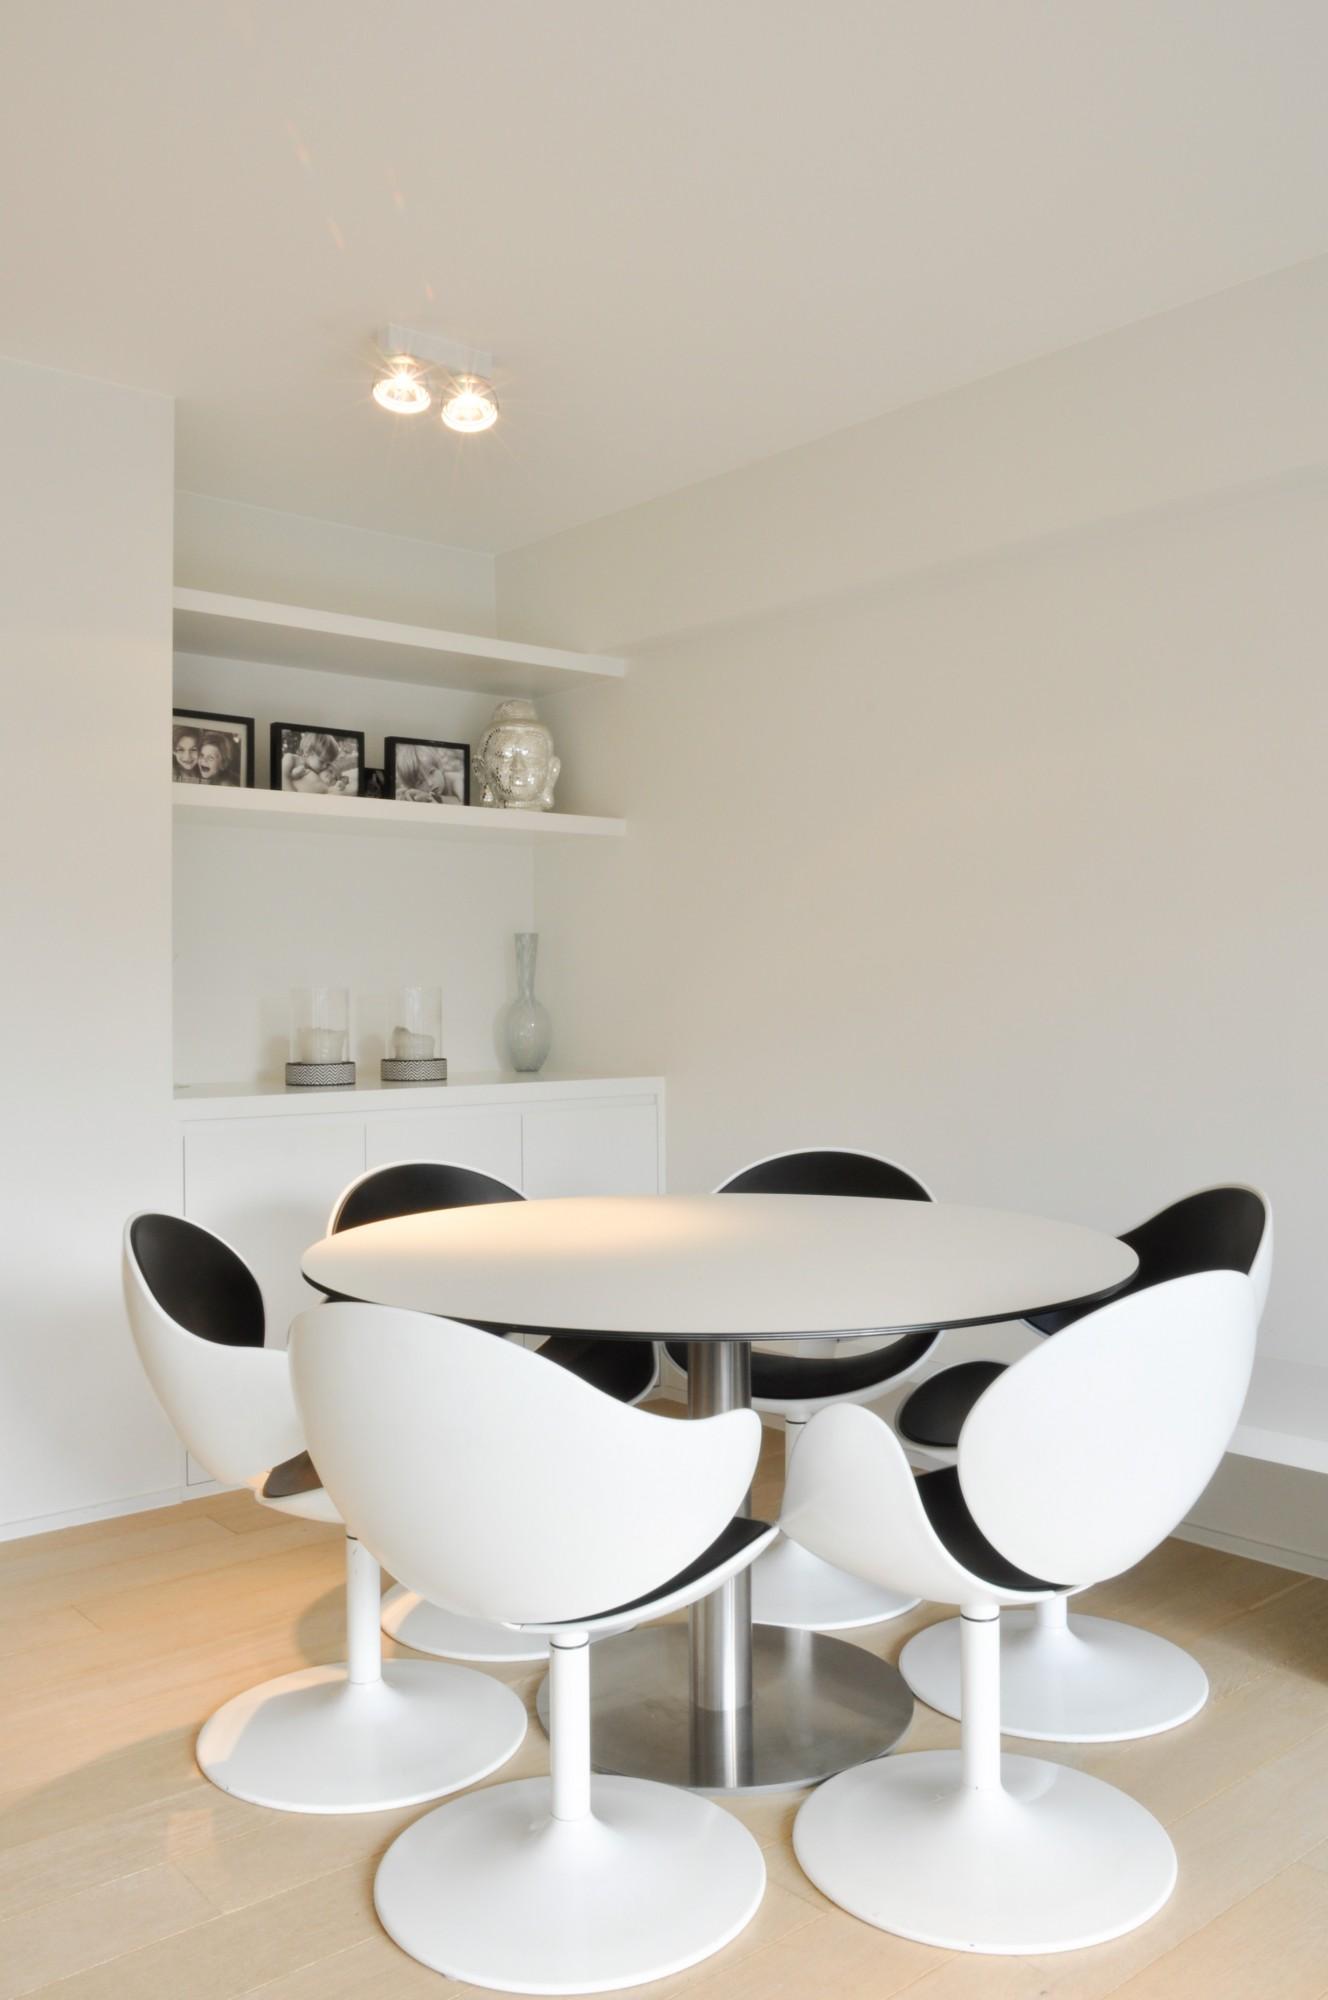 Vente Appartement 2 CH Knokke-Zoute - contemporain / face au minigolf Zoute